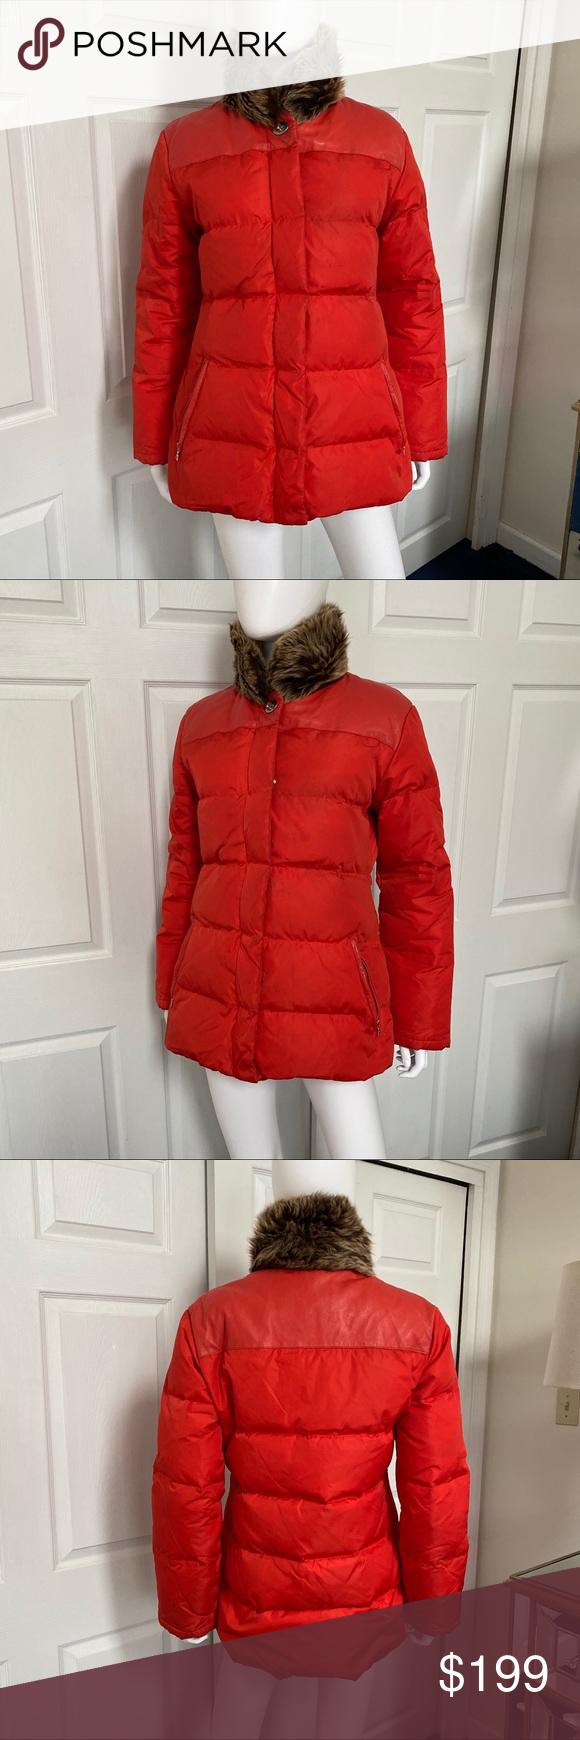 Coach Red Puffer Jacket W Leather Trim Fur Collar Red Puffer Jacket Jackets Puffer Jackets [ 1740 x 580 Pixel ]